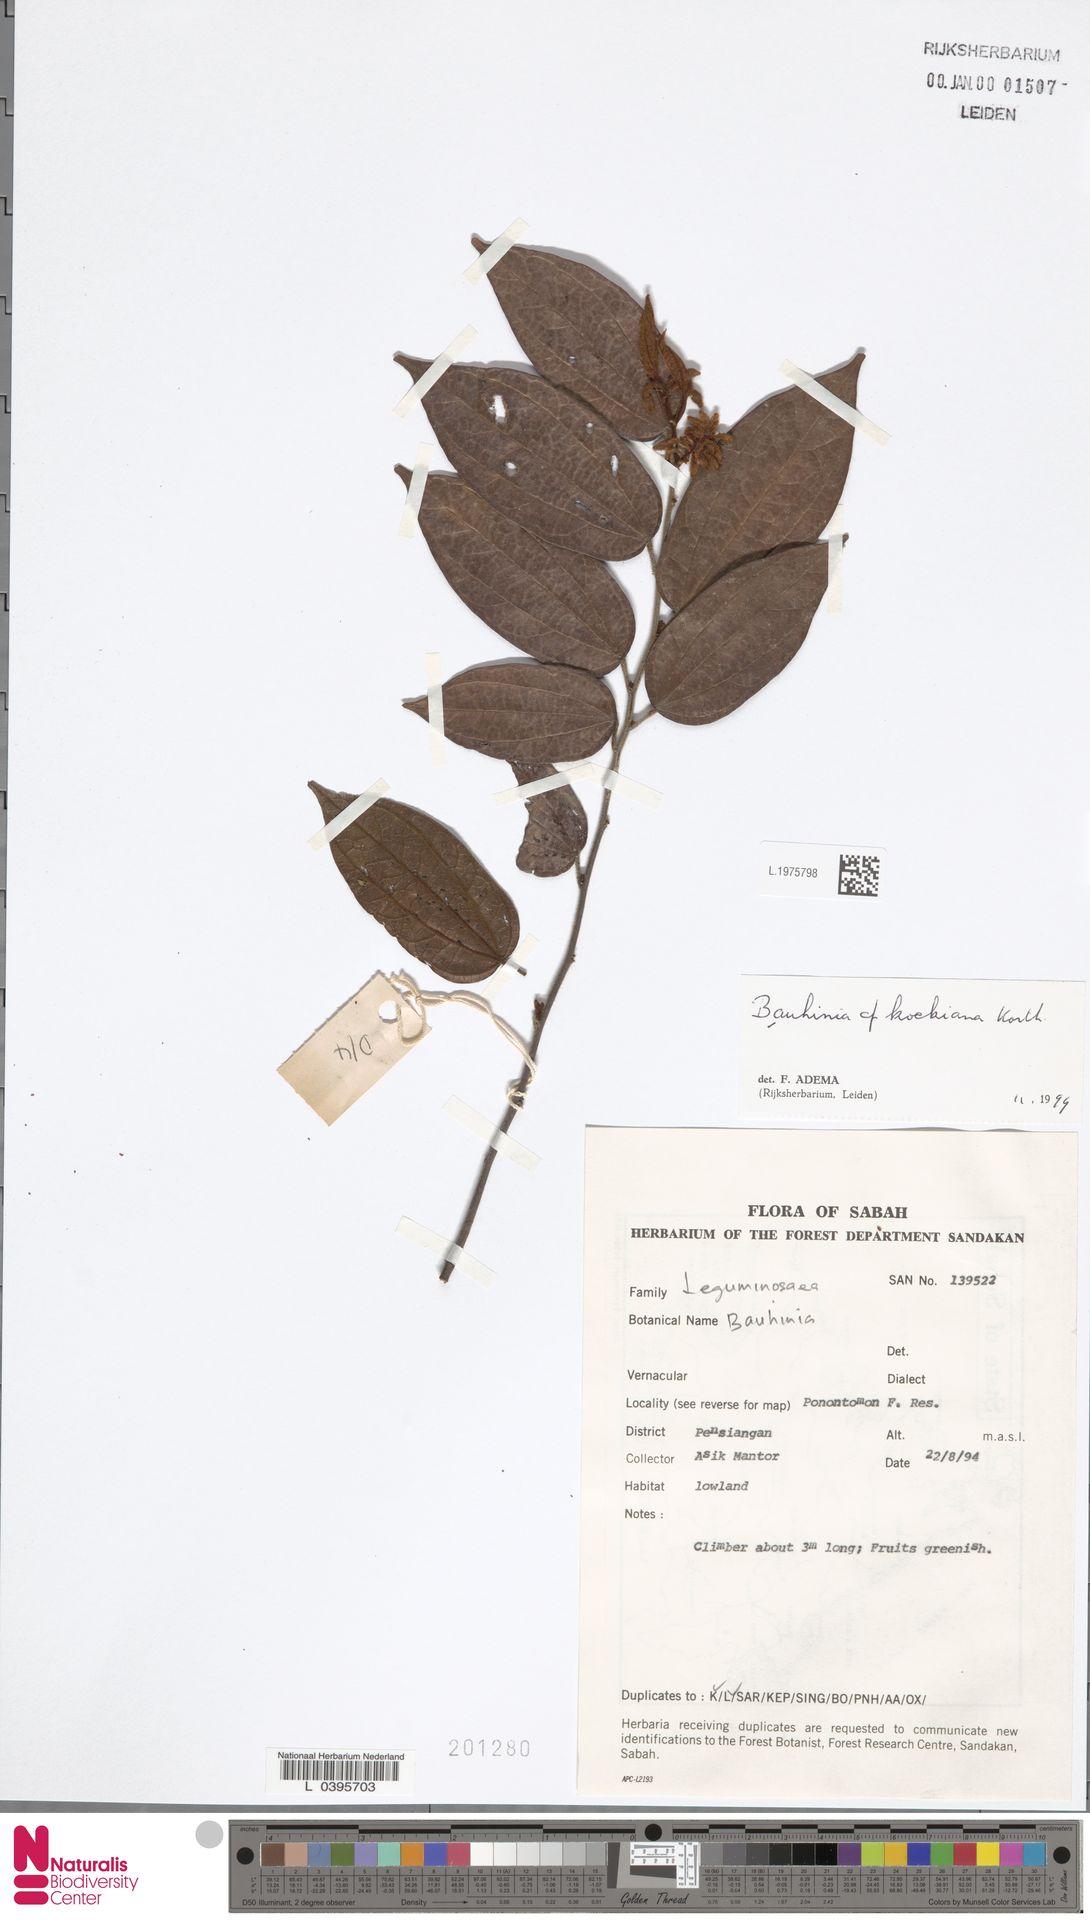 L.1975798   Bauhinia kockiana Korth.